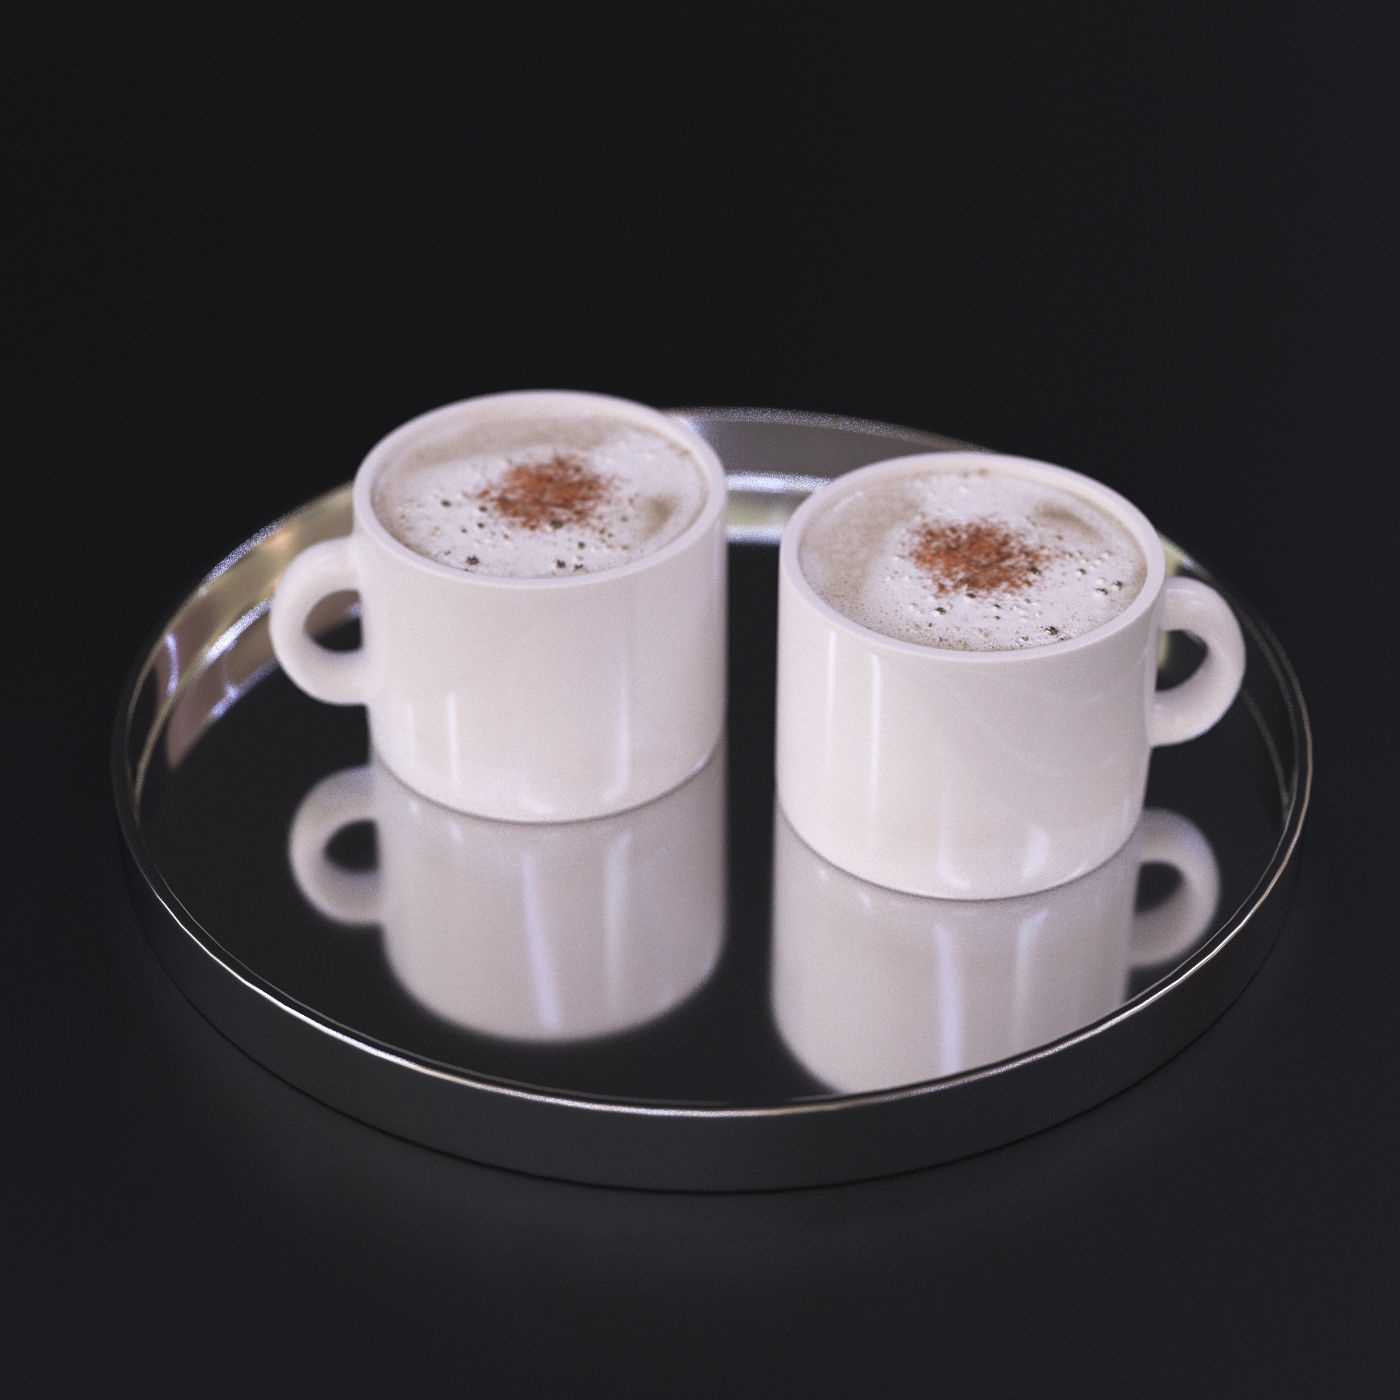 Cappuccino coffee on a chrome tray